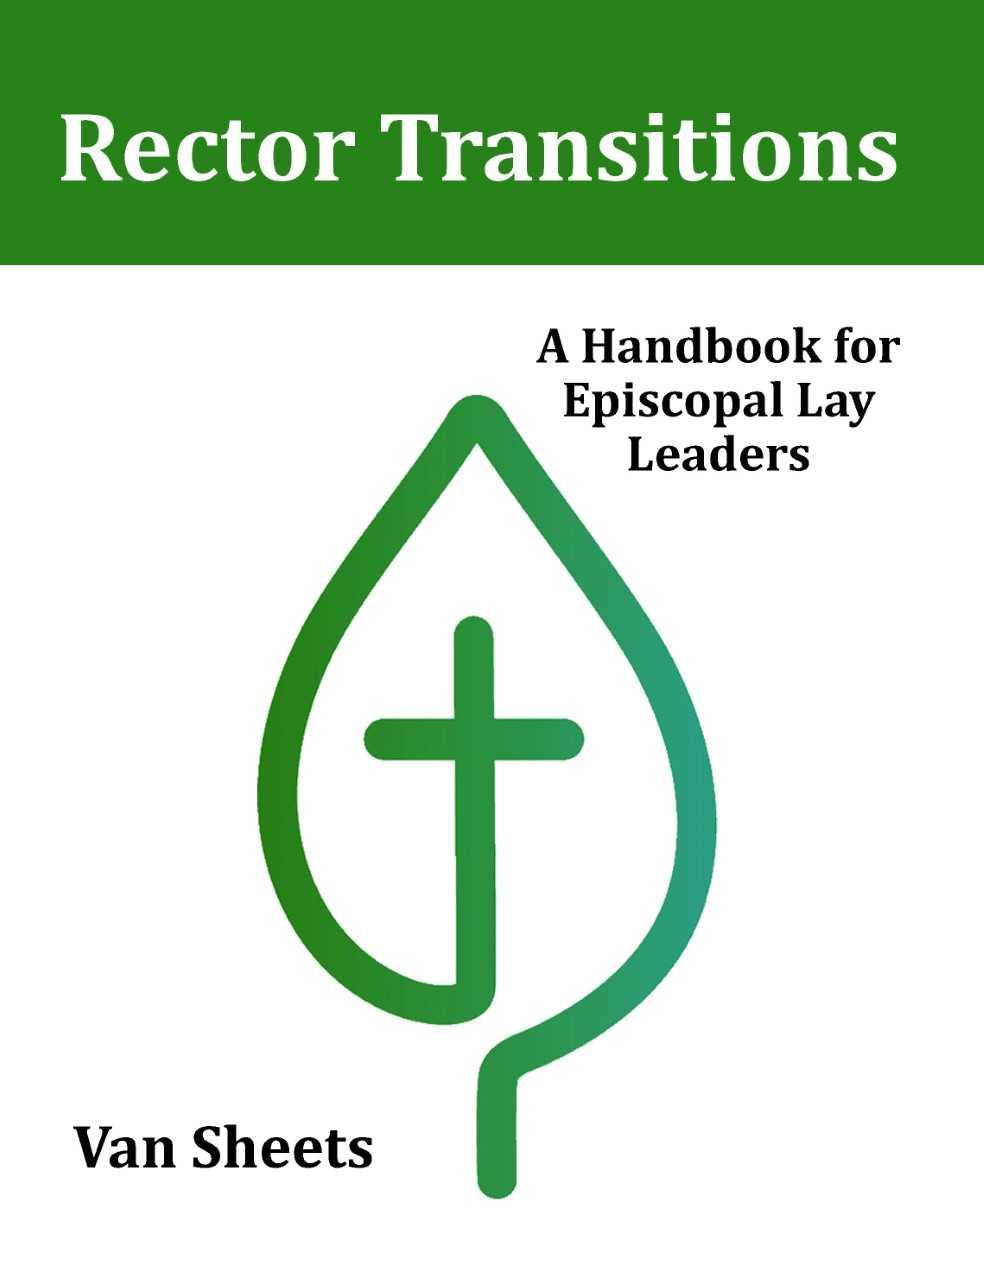 Vts Press Announces Publication Of Rector Transitions Episcopal